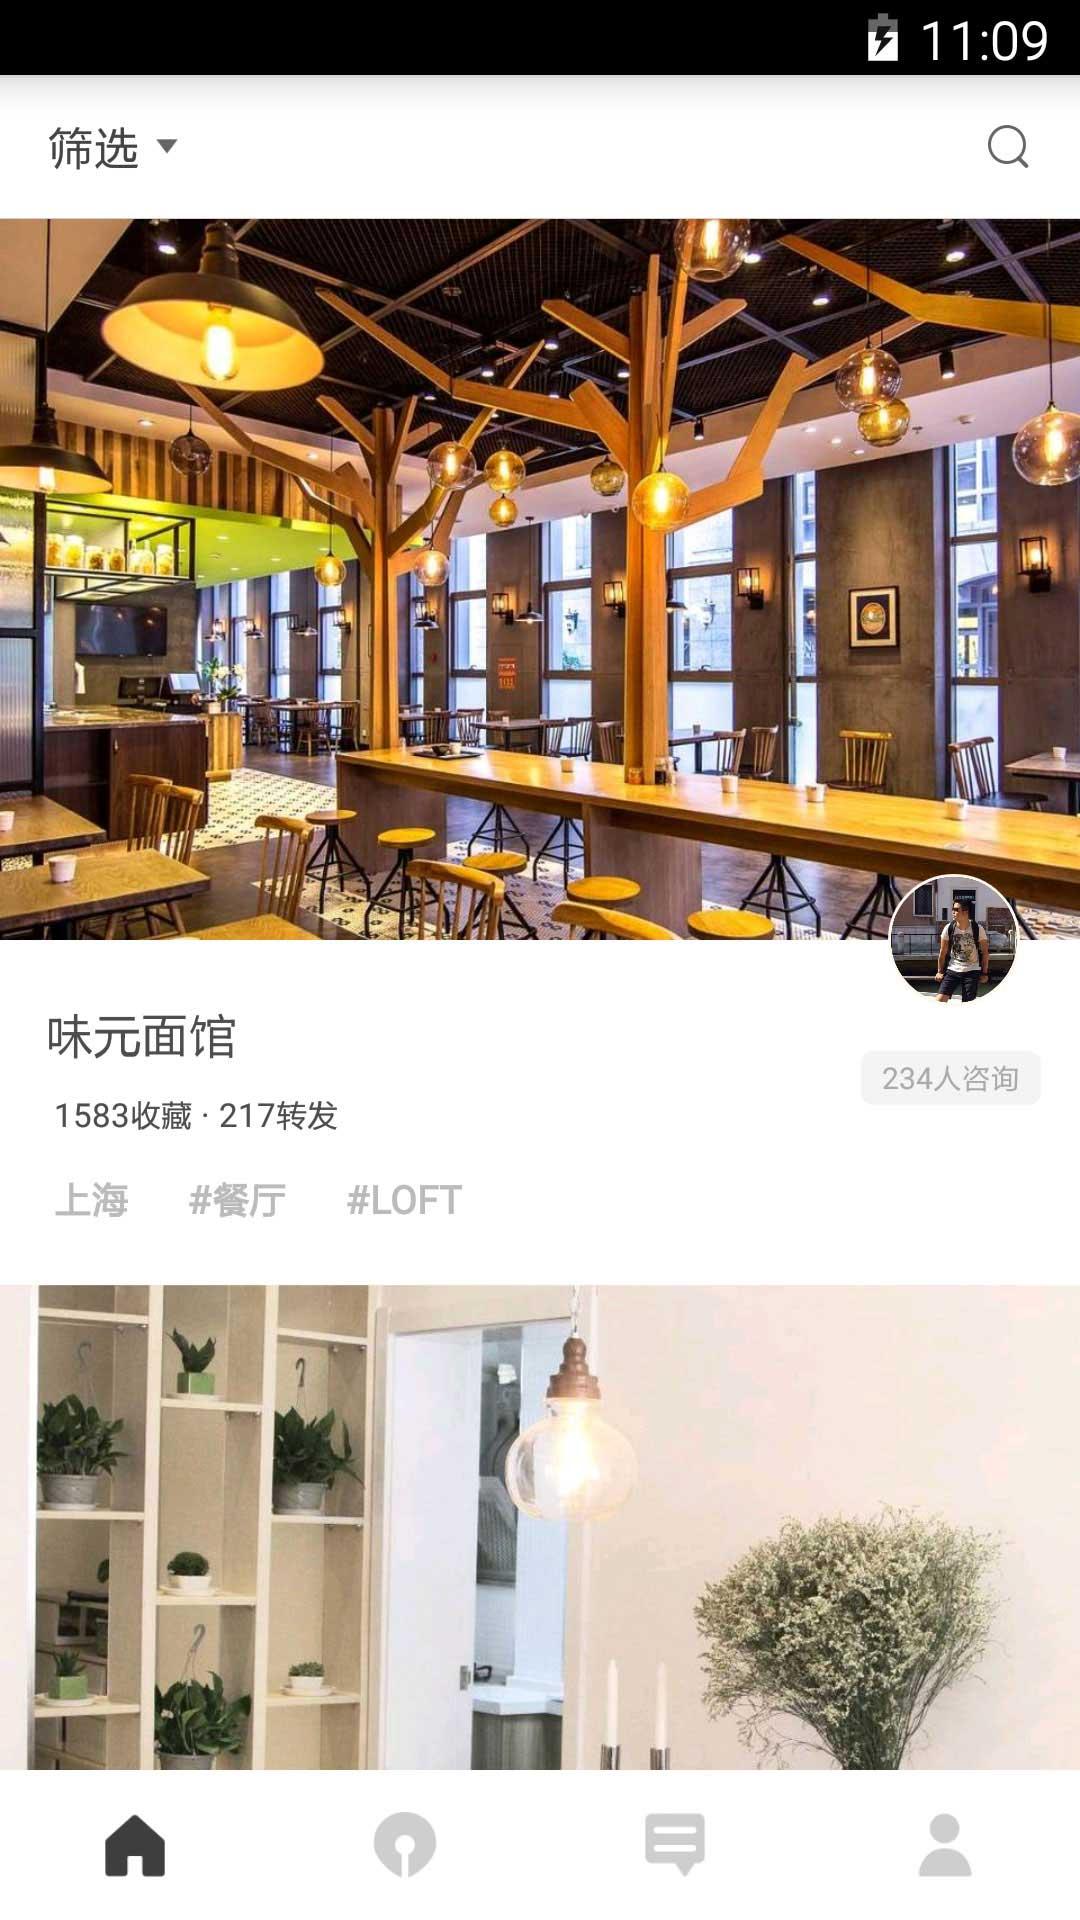 (PChome Store)商店街市集國際資訊股份有限公司─1111人力銀行